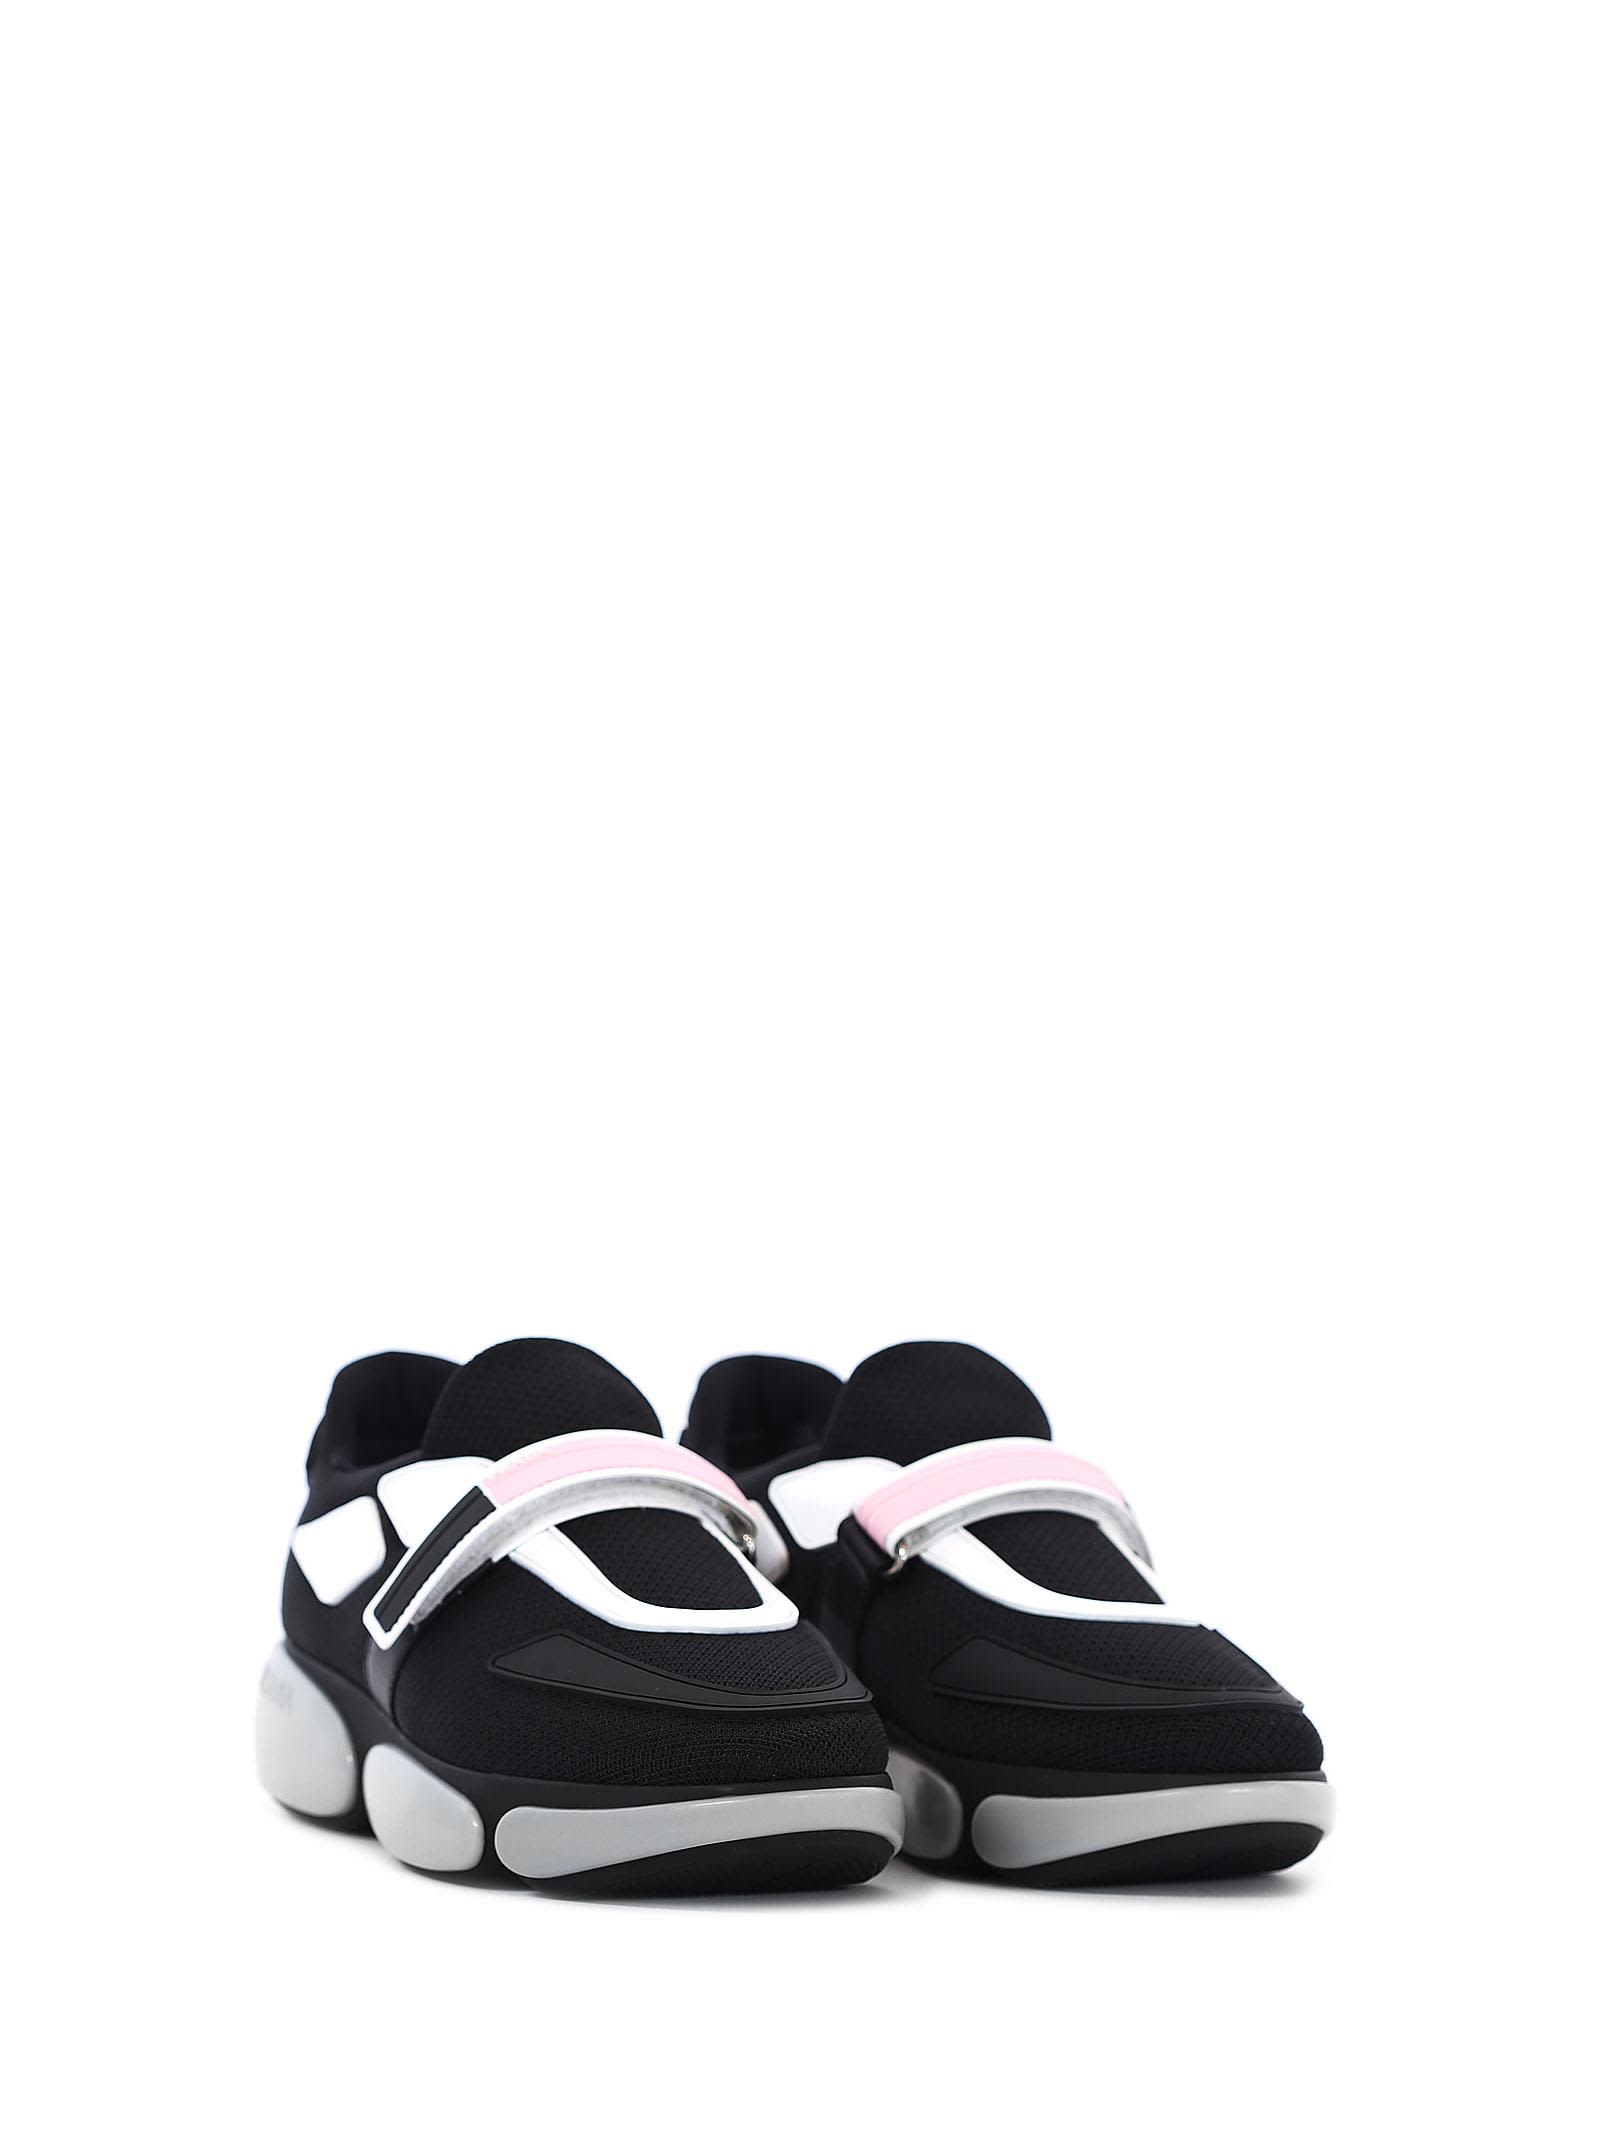 Chaussures De Sport De Tissu Cloudbust Prada YWDr8